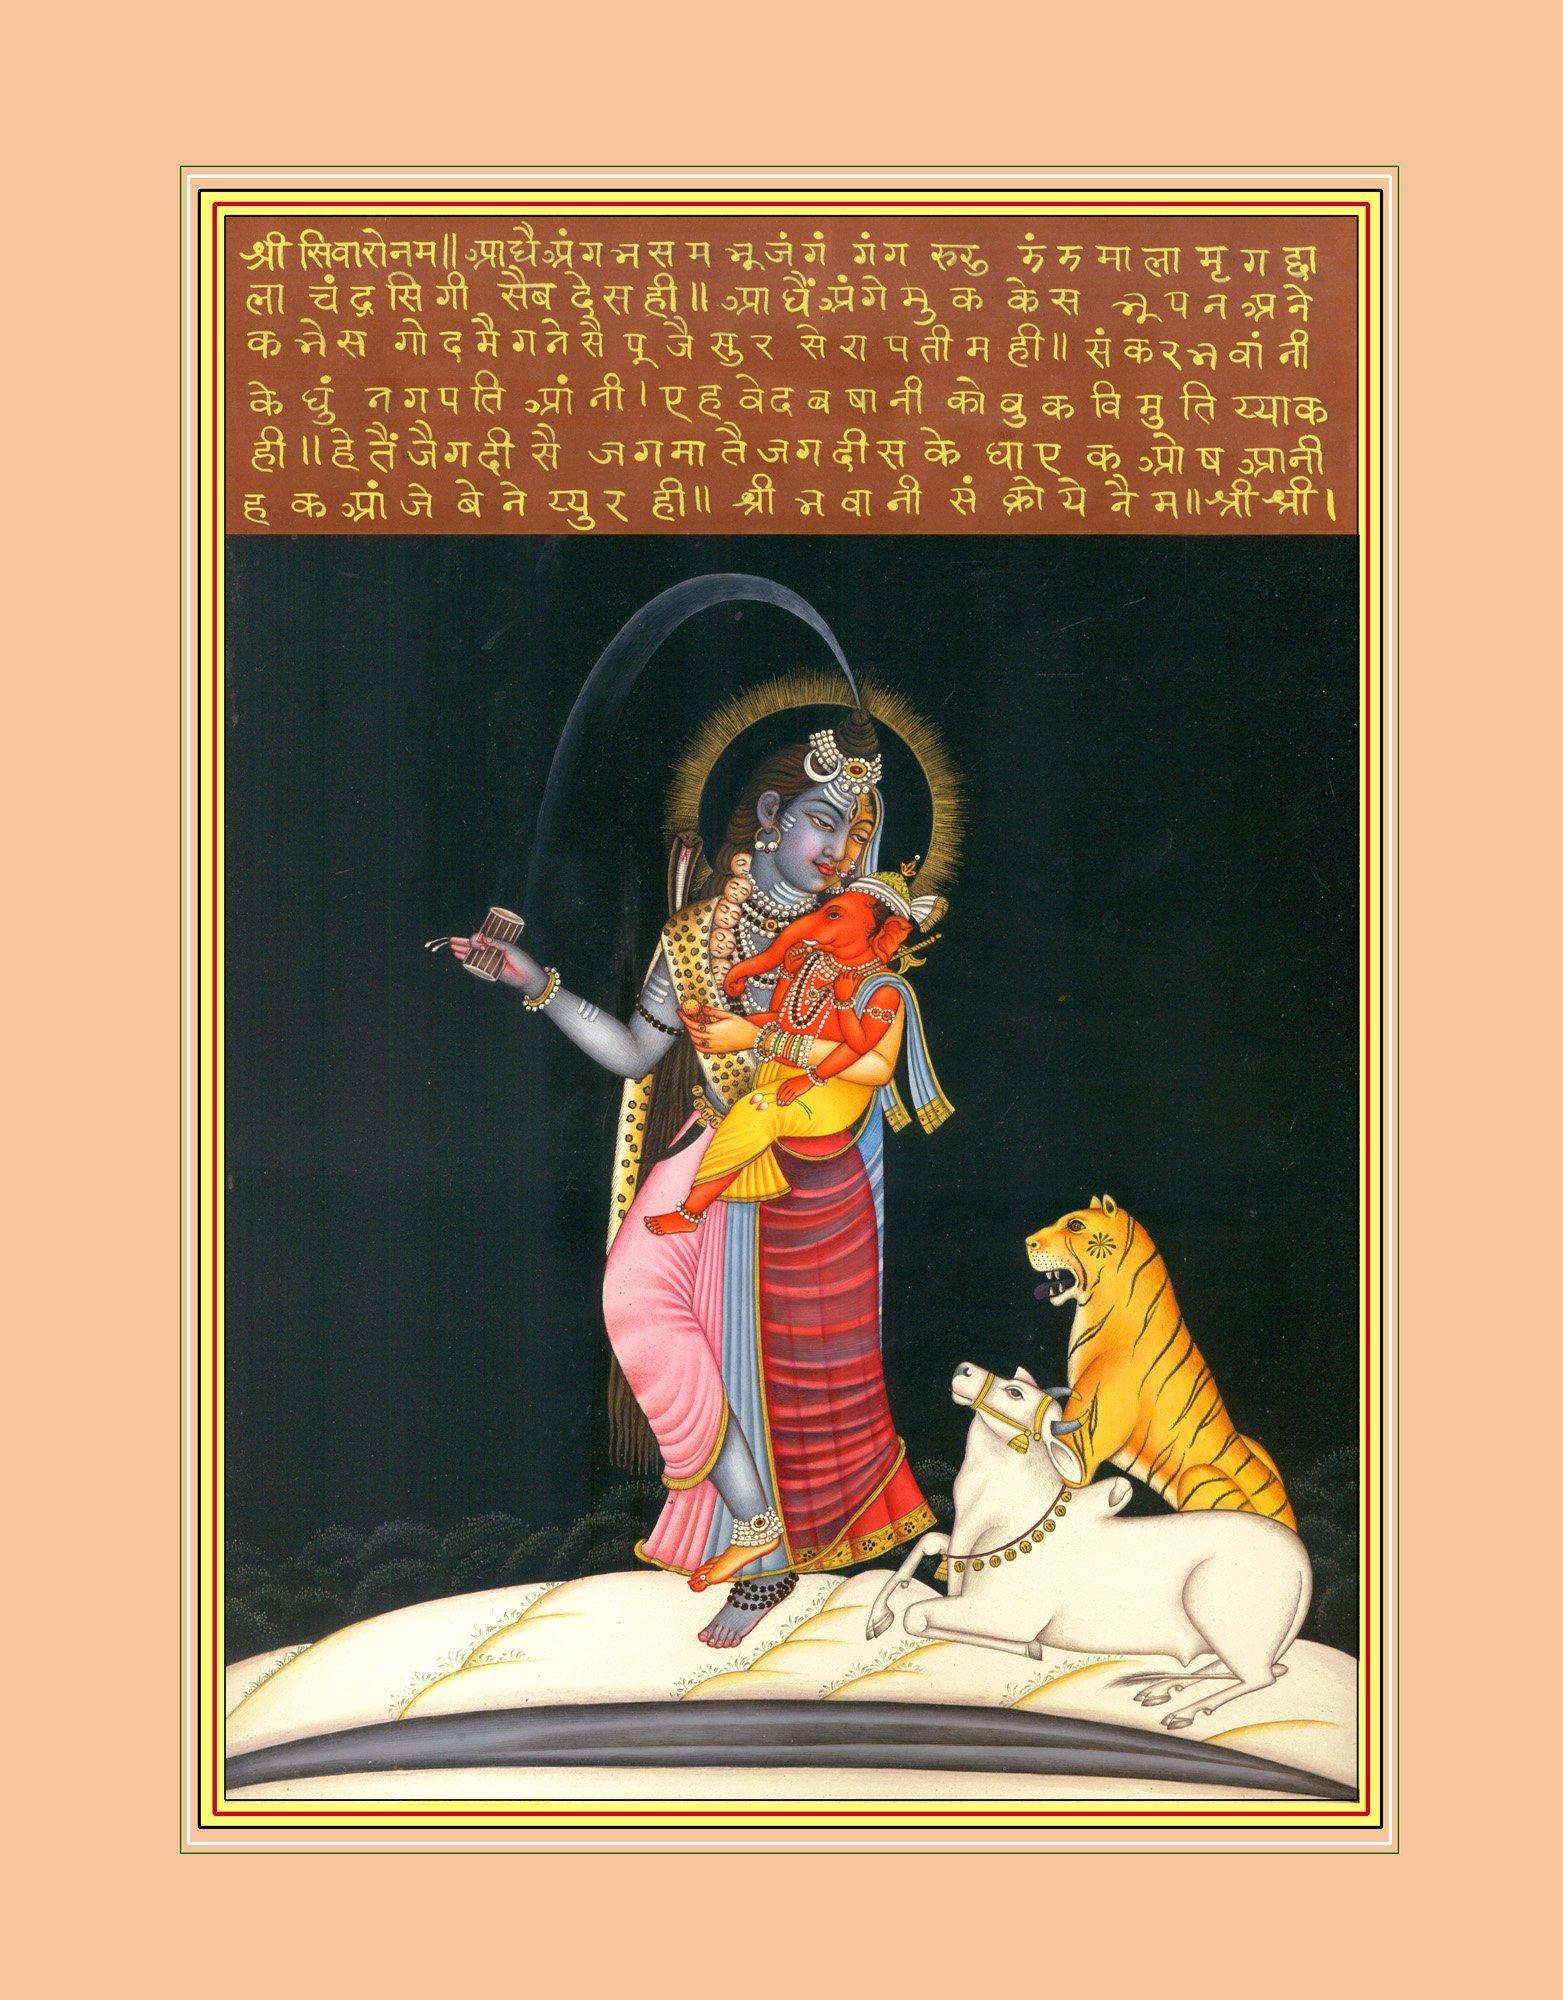 Ardha-Narishvara Shiva with Child Ganesha in Lap - Water Color Painting on Paper - Artist: Kailash Raj